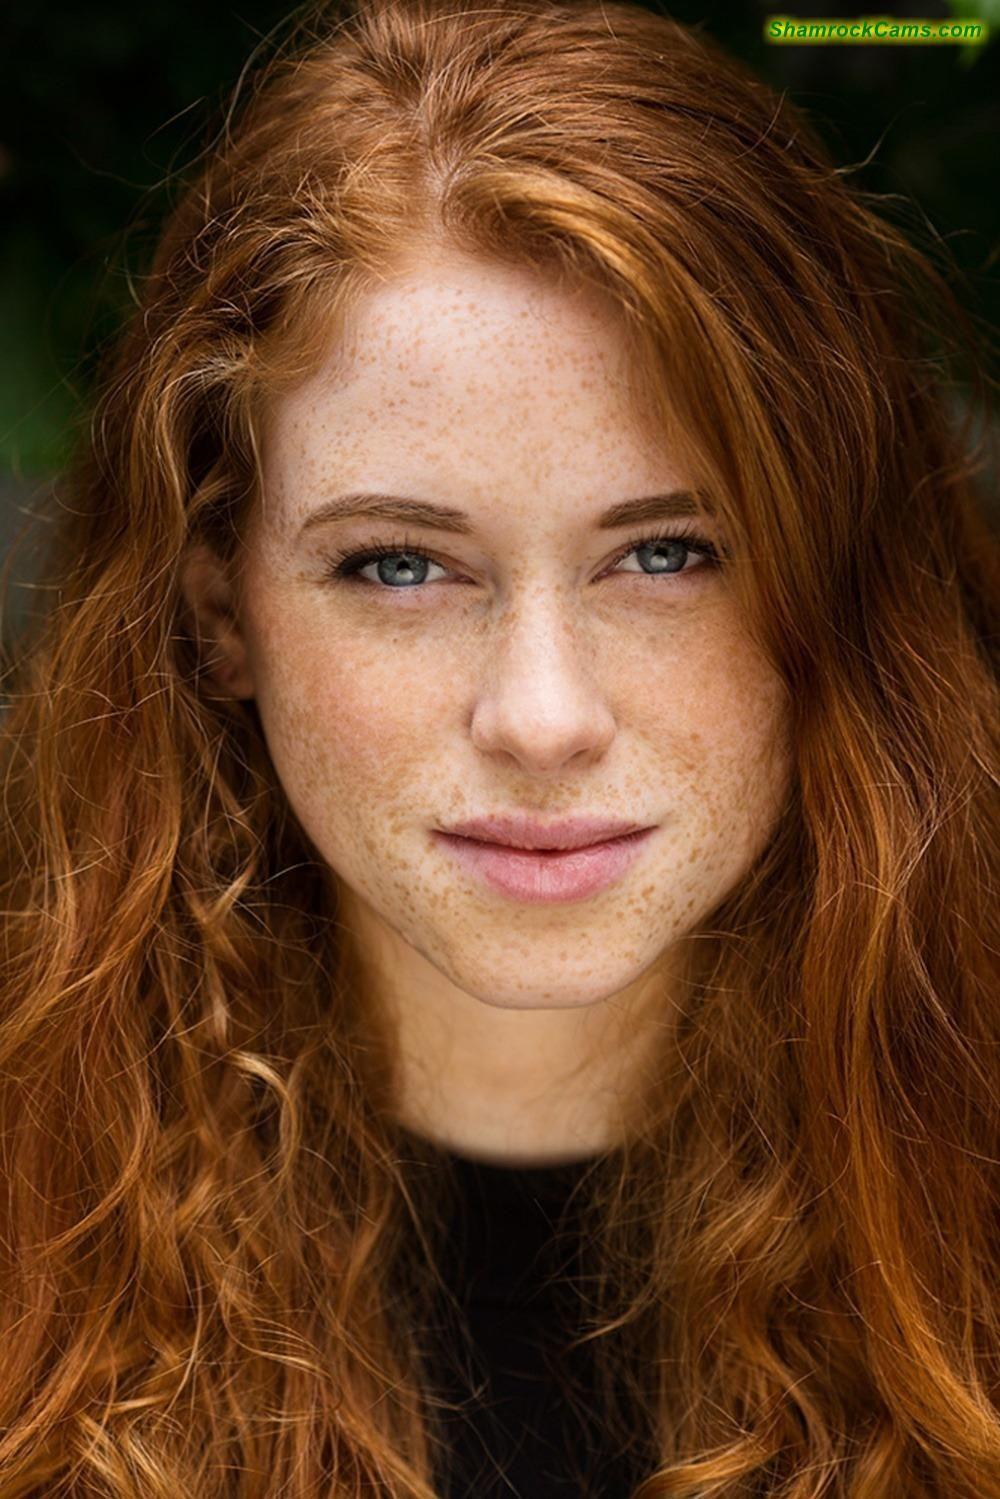 Pale redhead pic foto 33